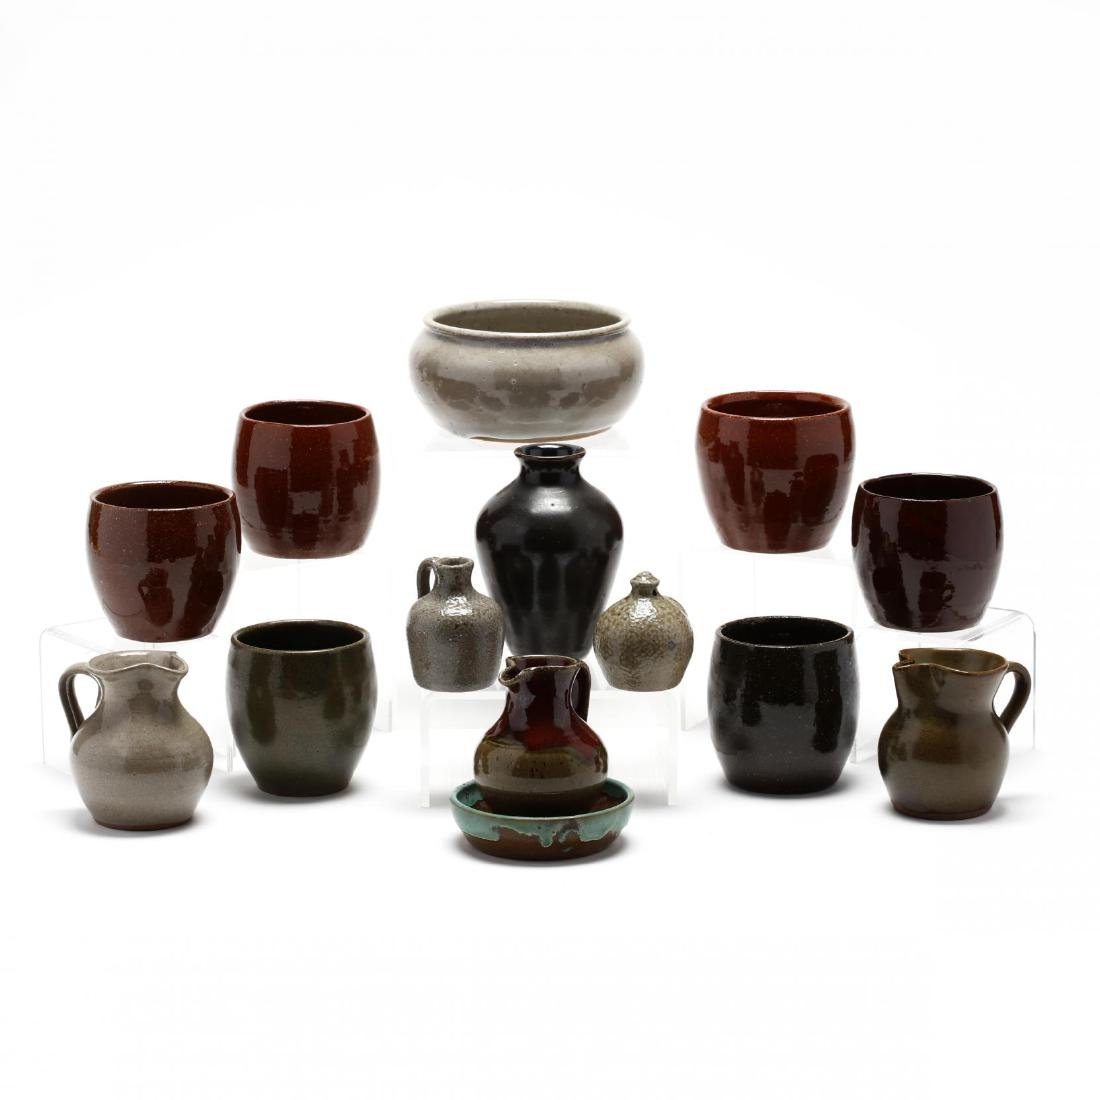 An Assortment of Jugtown Pottery